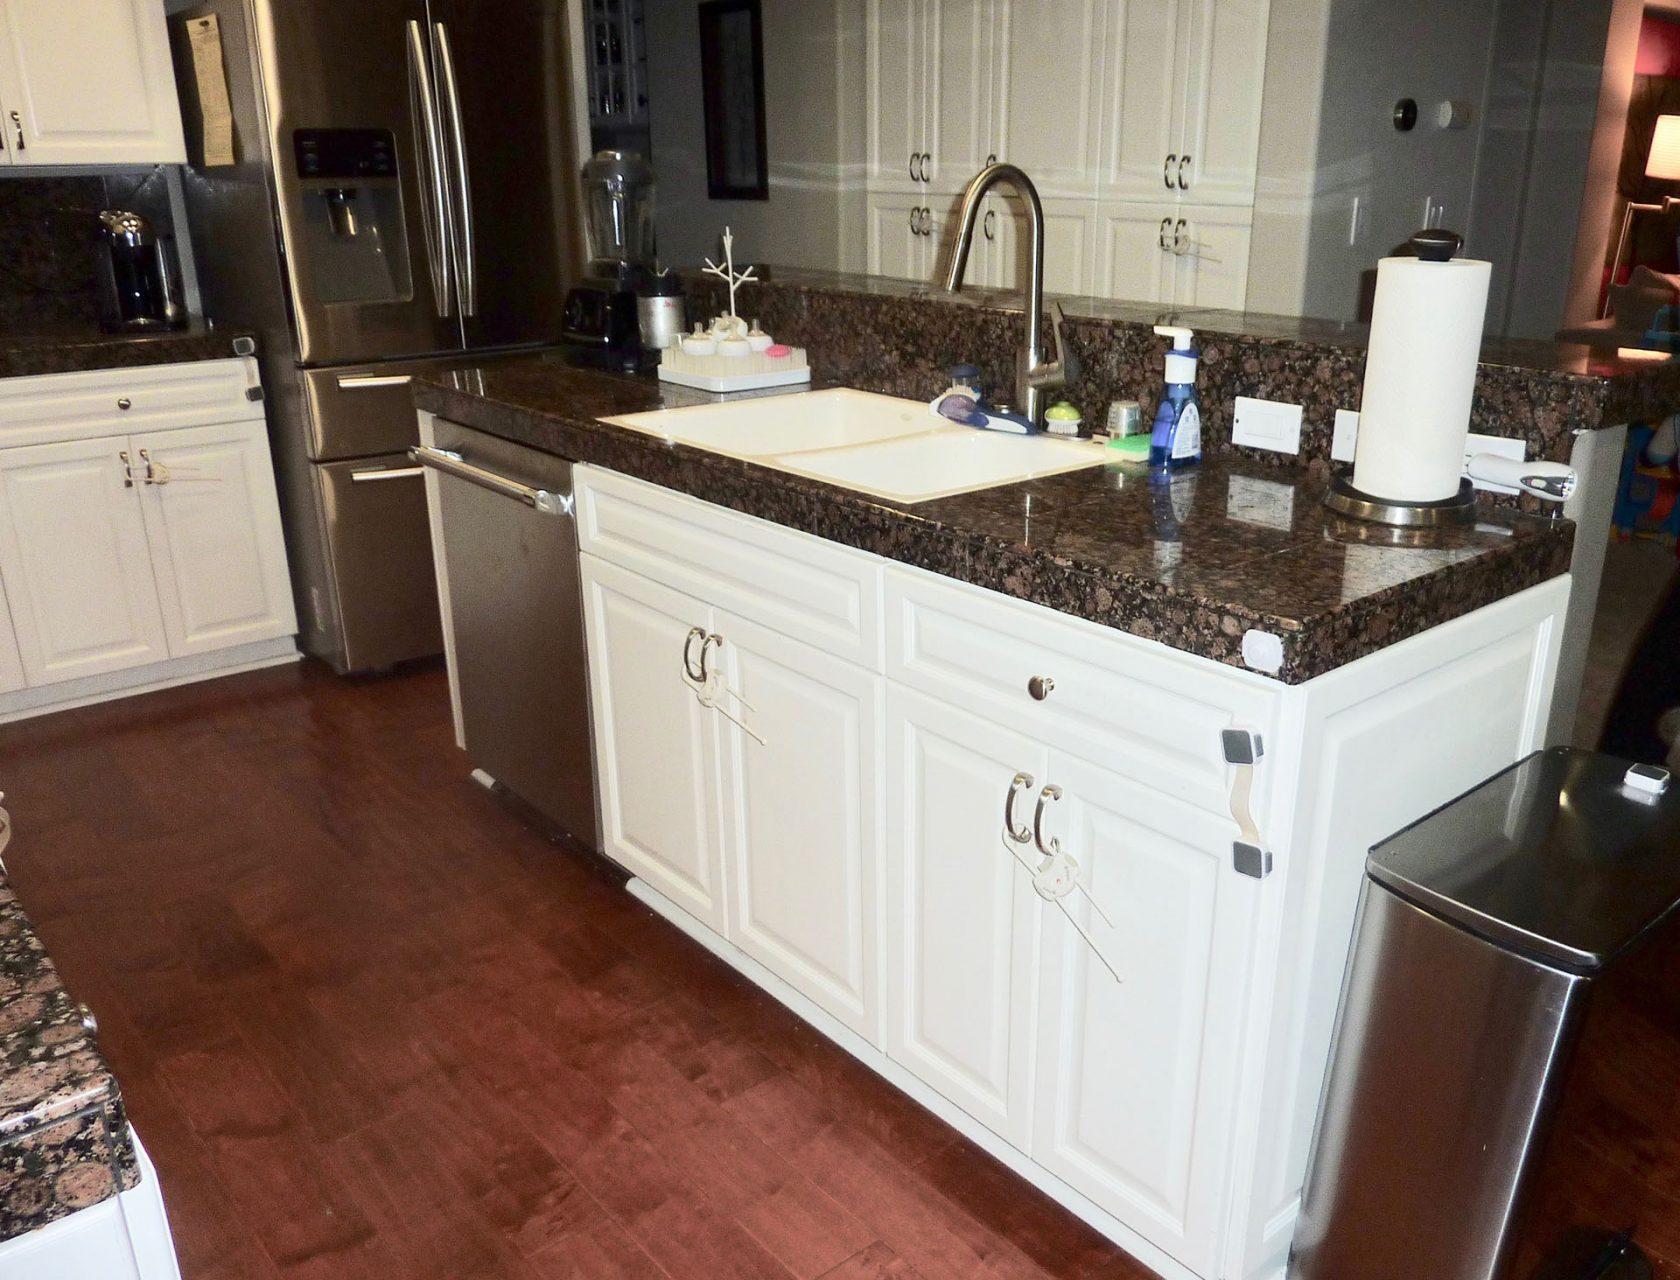 Kitchen needed remodel